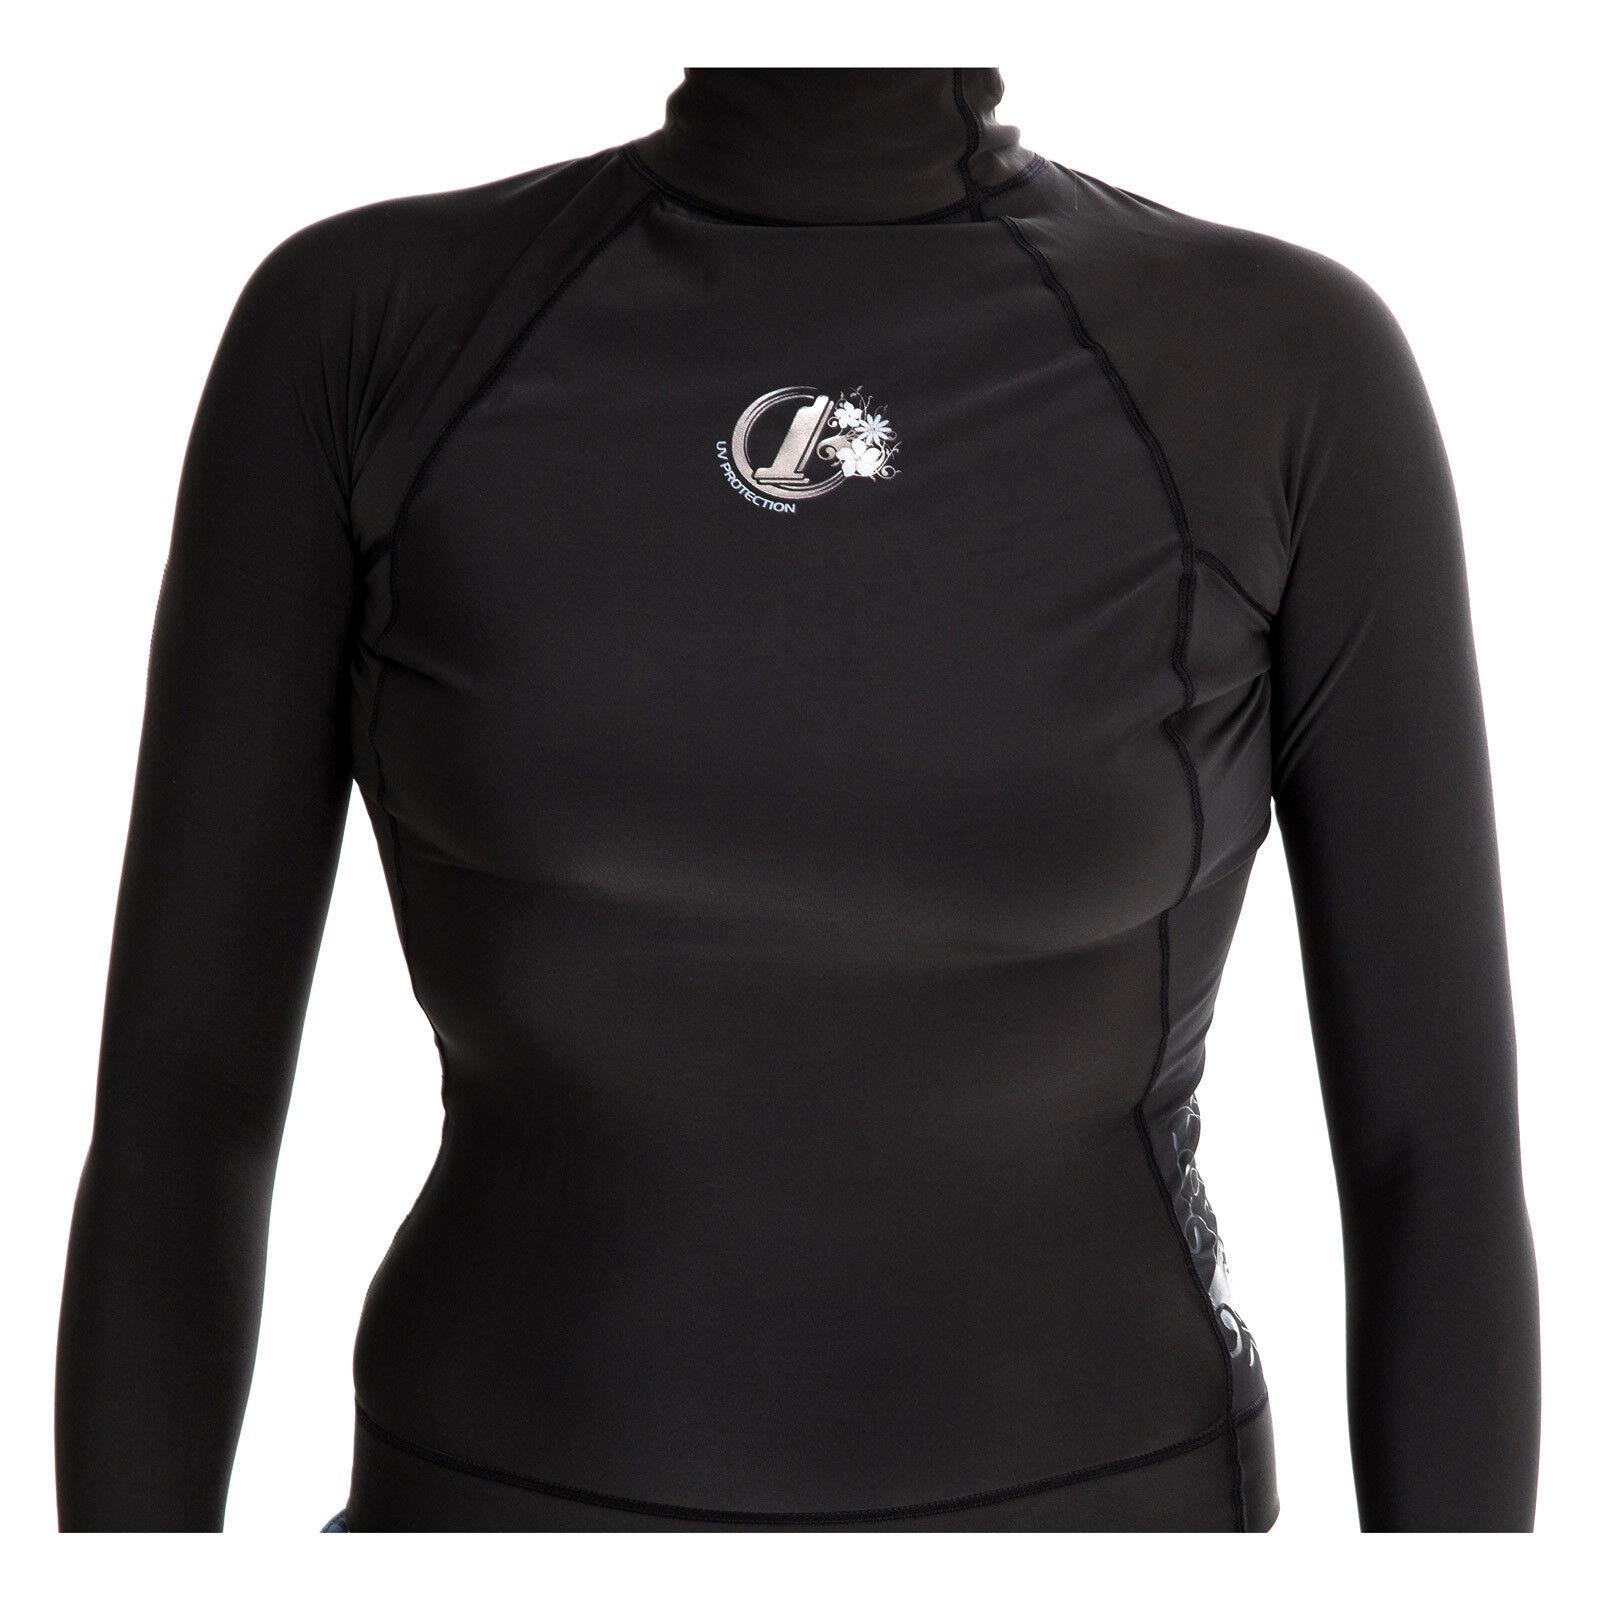 Womens Polypro Thermal Long Sleeve Rash Vest